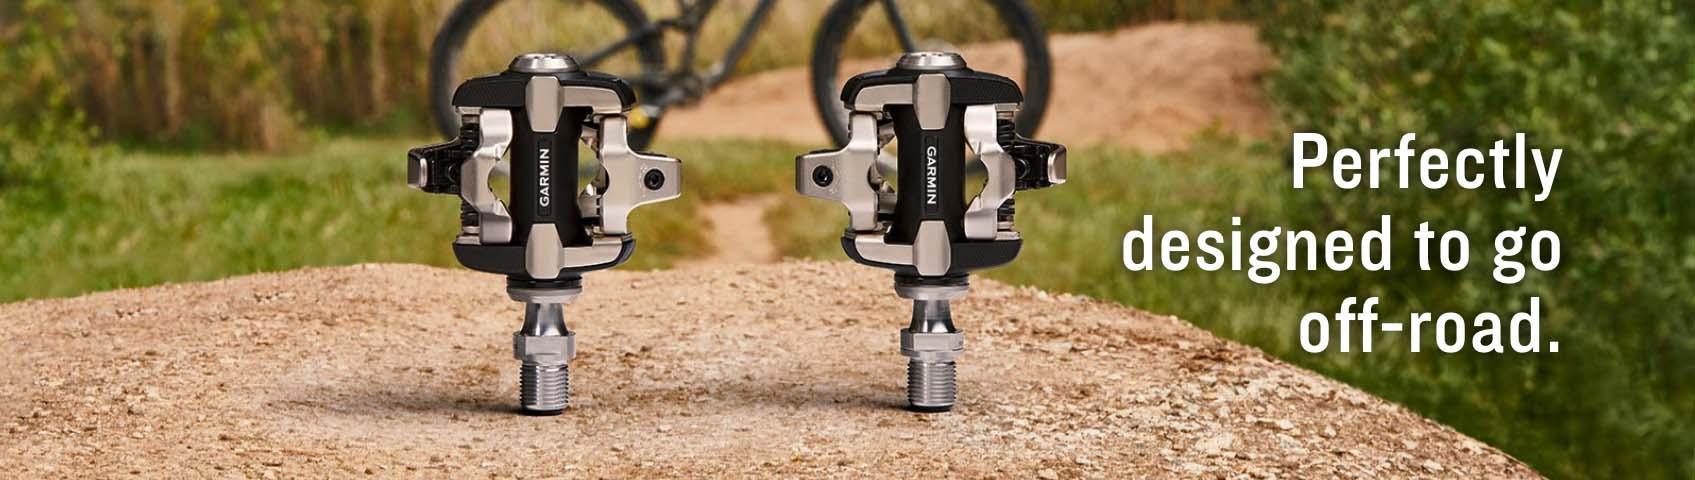 Garmin Rally XC200 Dual-sensing Power Meter Pedals - Shimano SPD